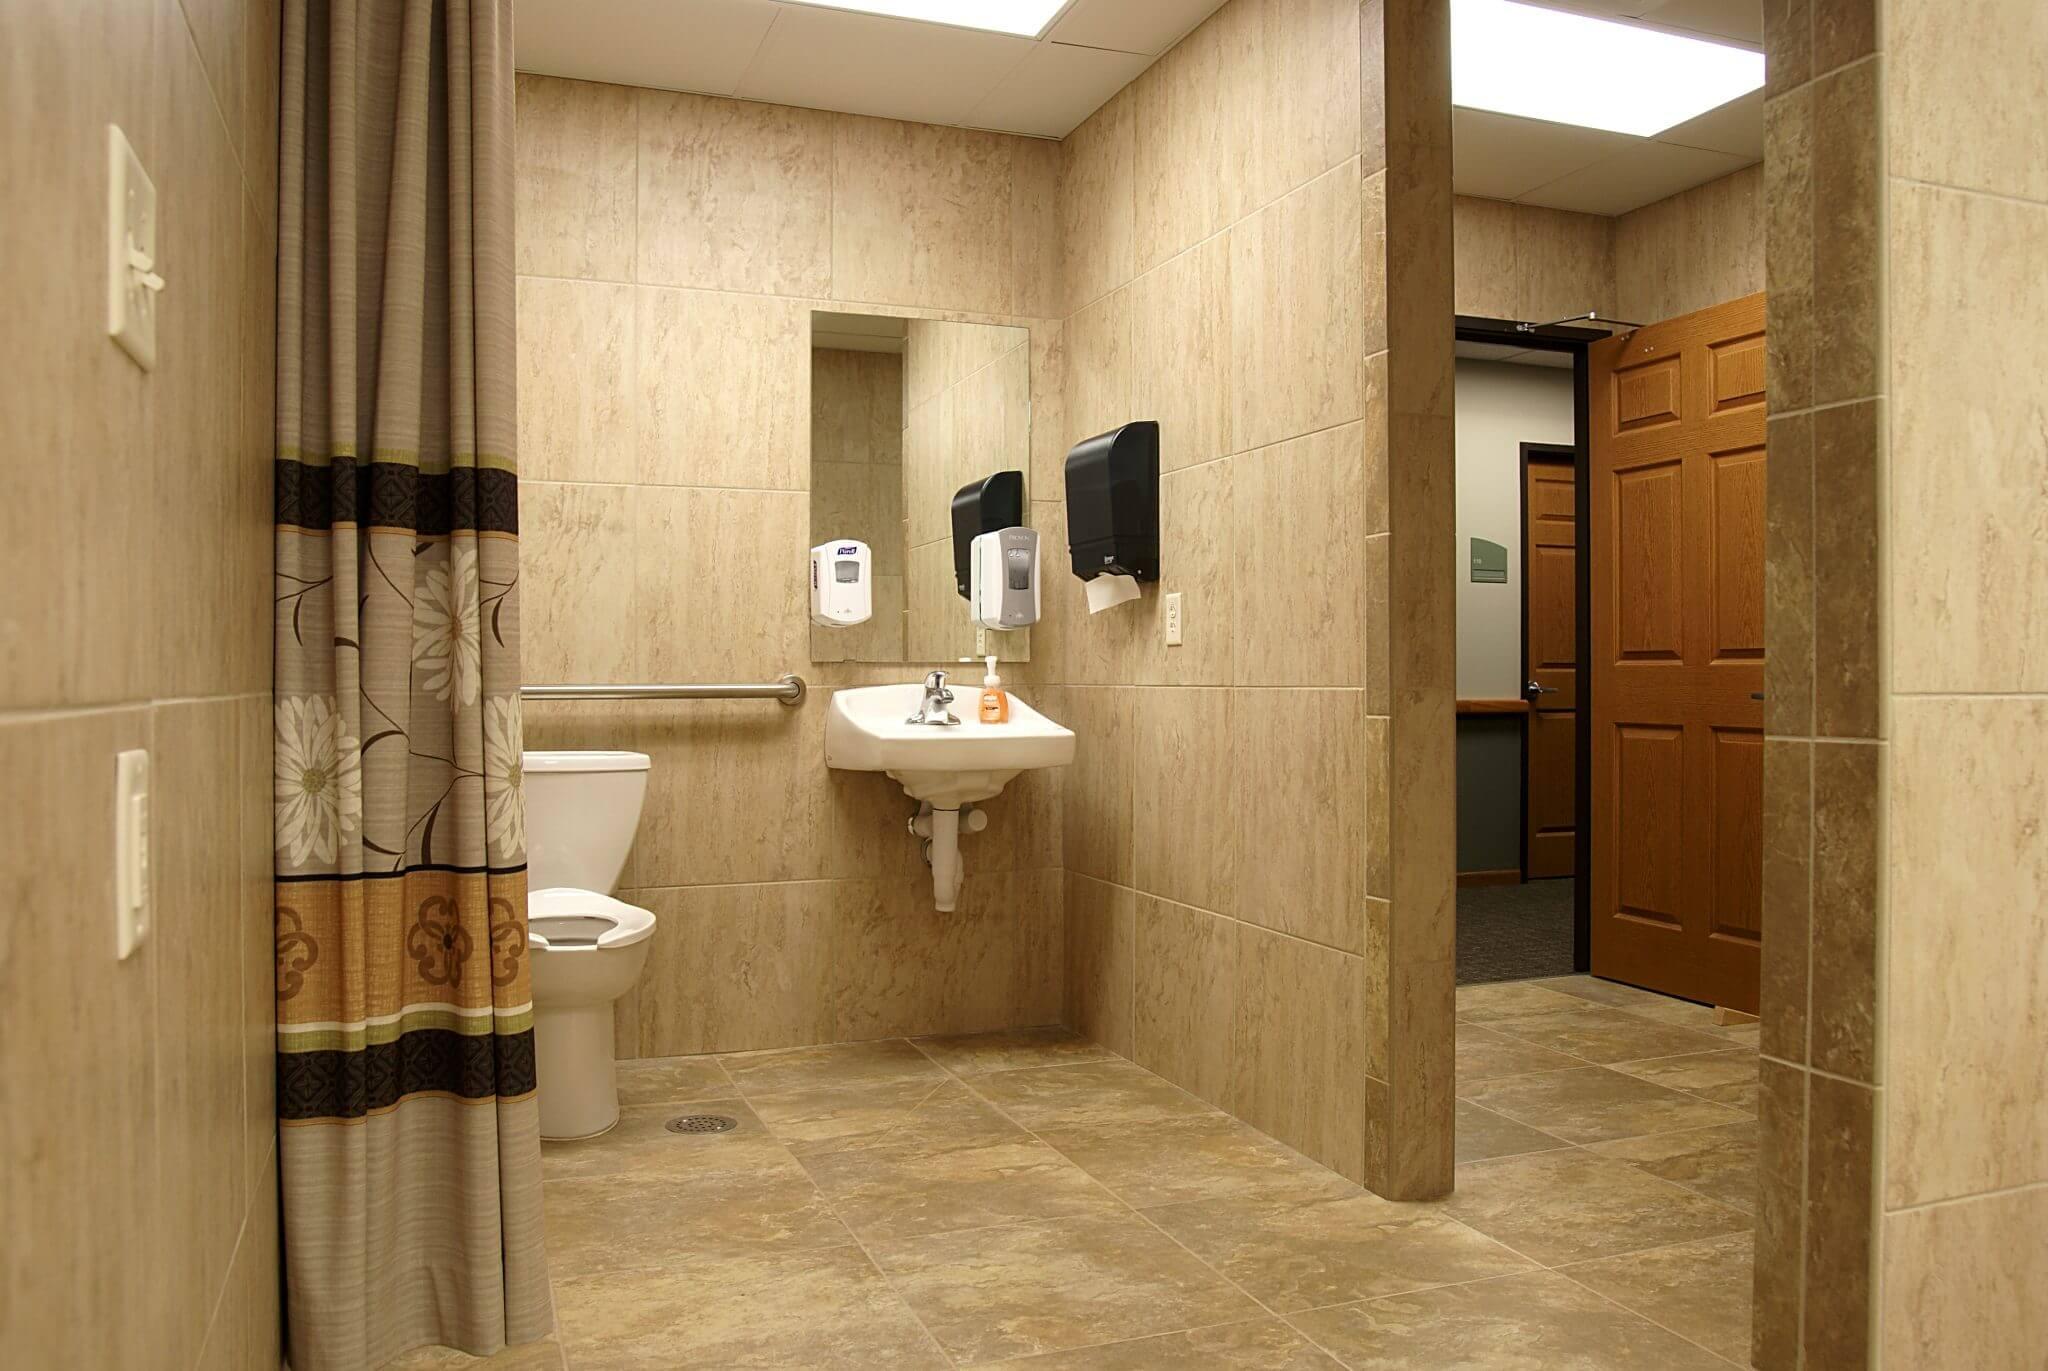 interior shot of bathroom